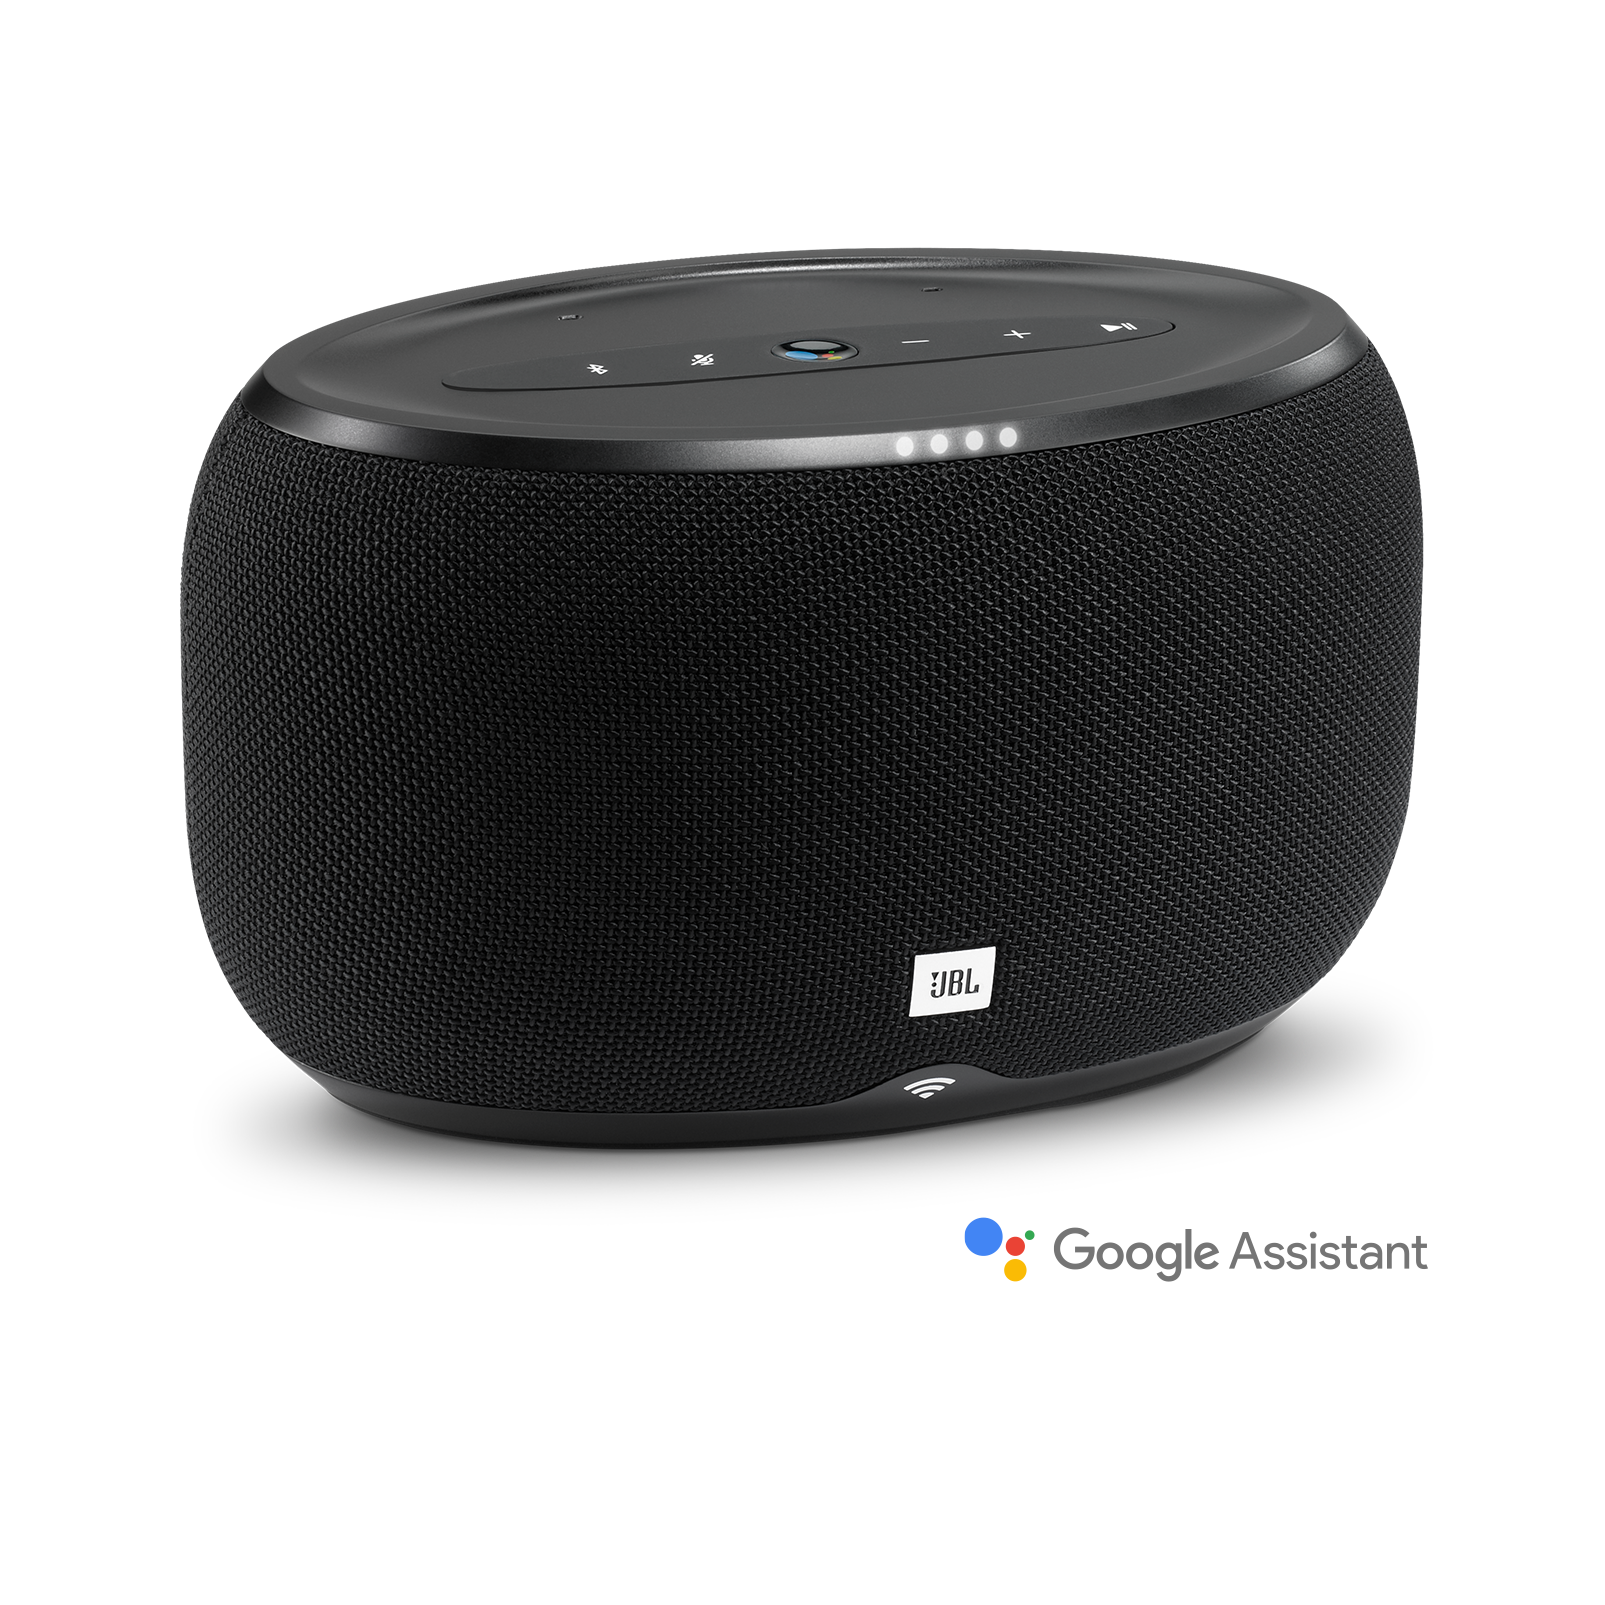 Black JBL Link300 Series Wireless Bluetooth Voice-Activated Speaker